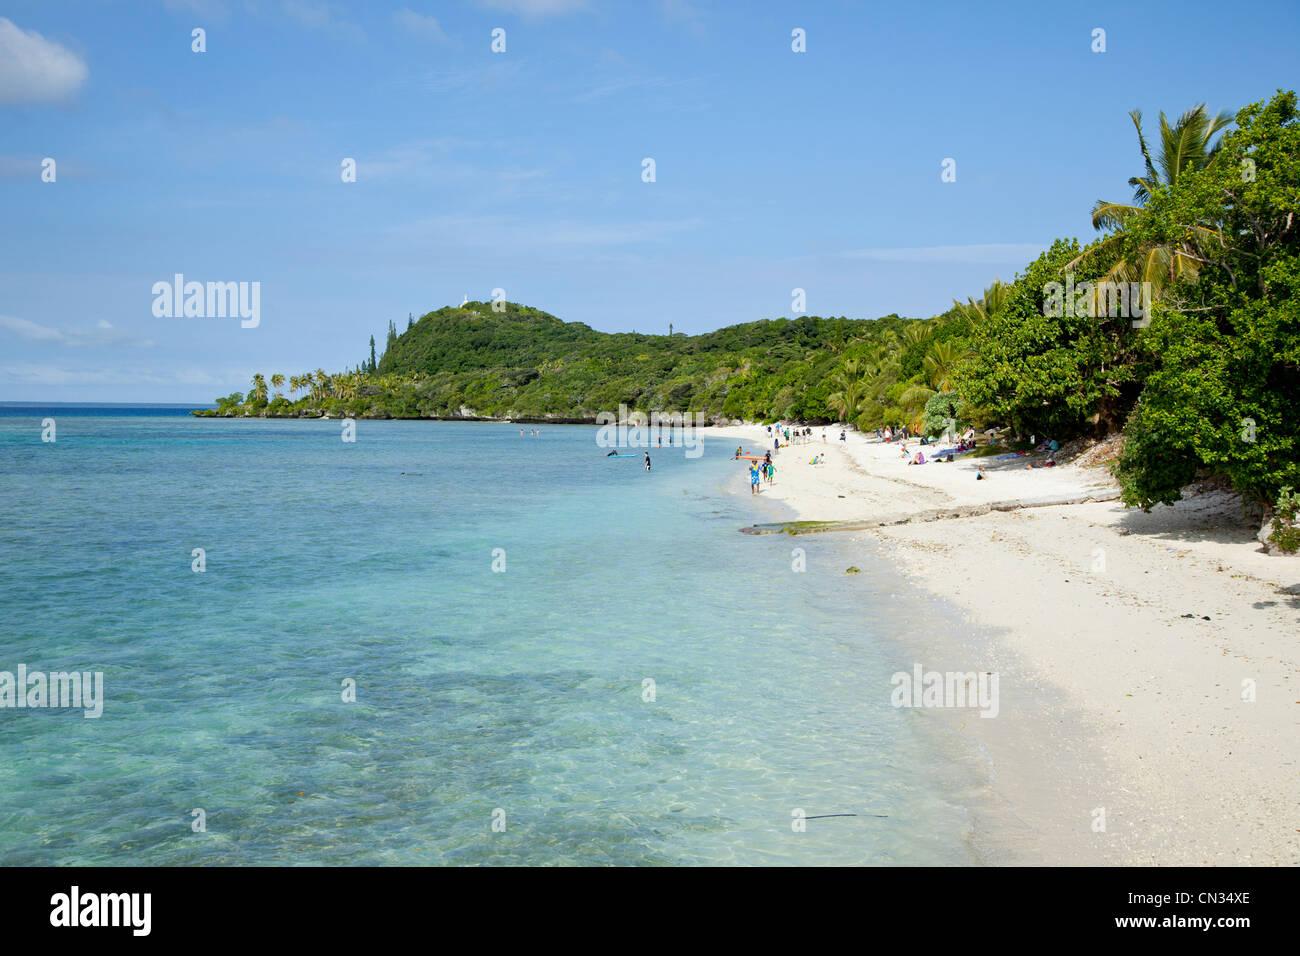 Coast Lifou New Caledonia - Stock Image